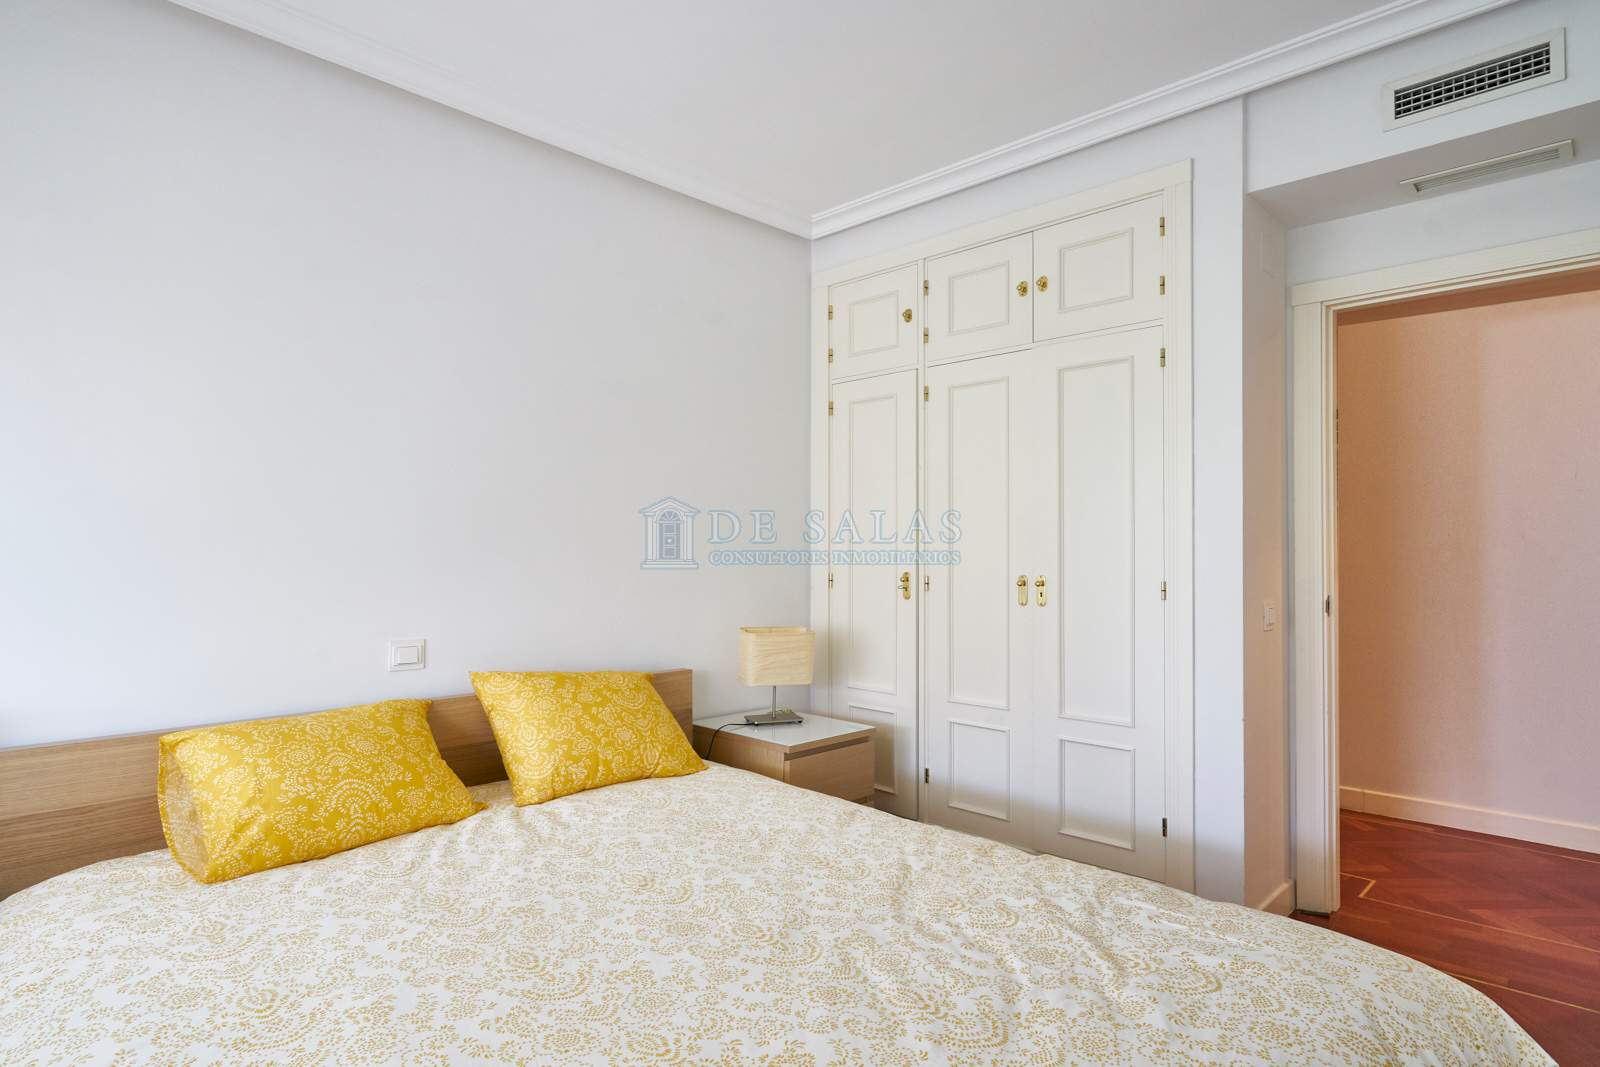 Dormitorio-0014